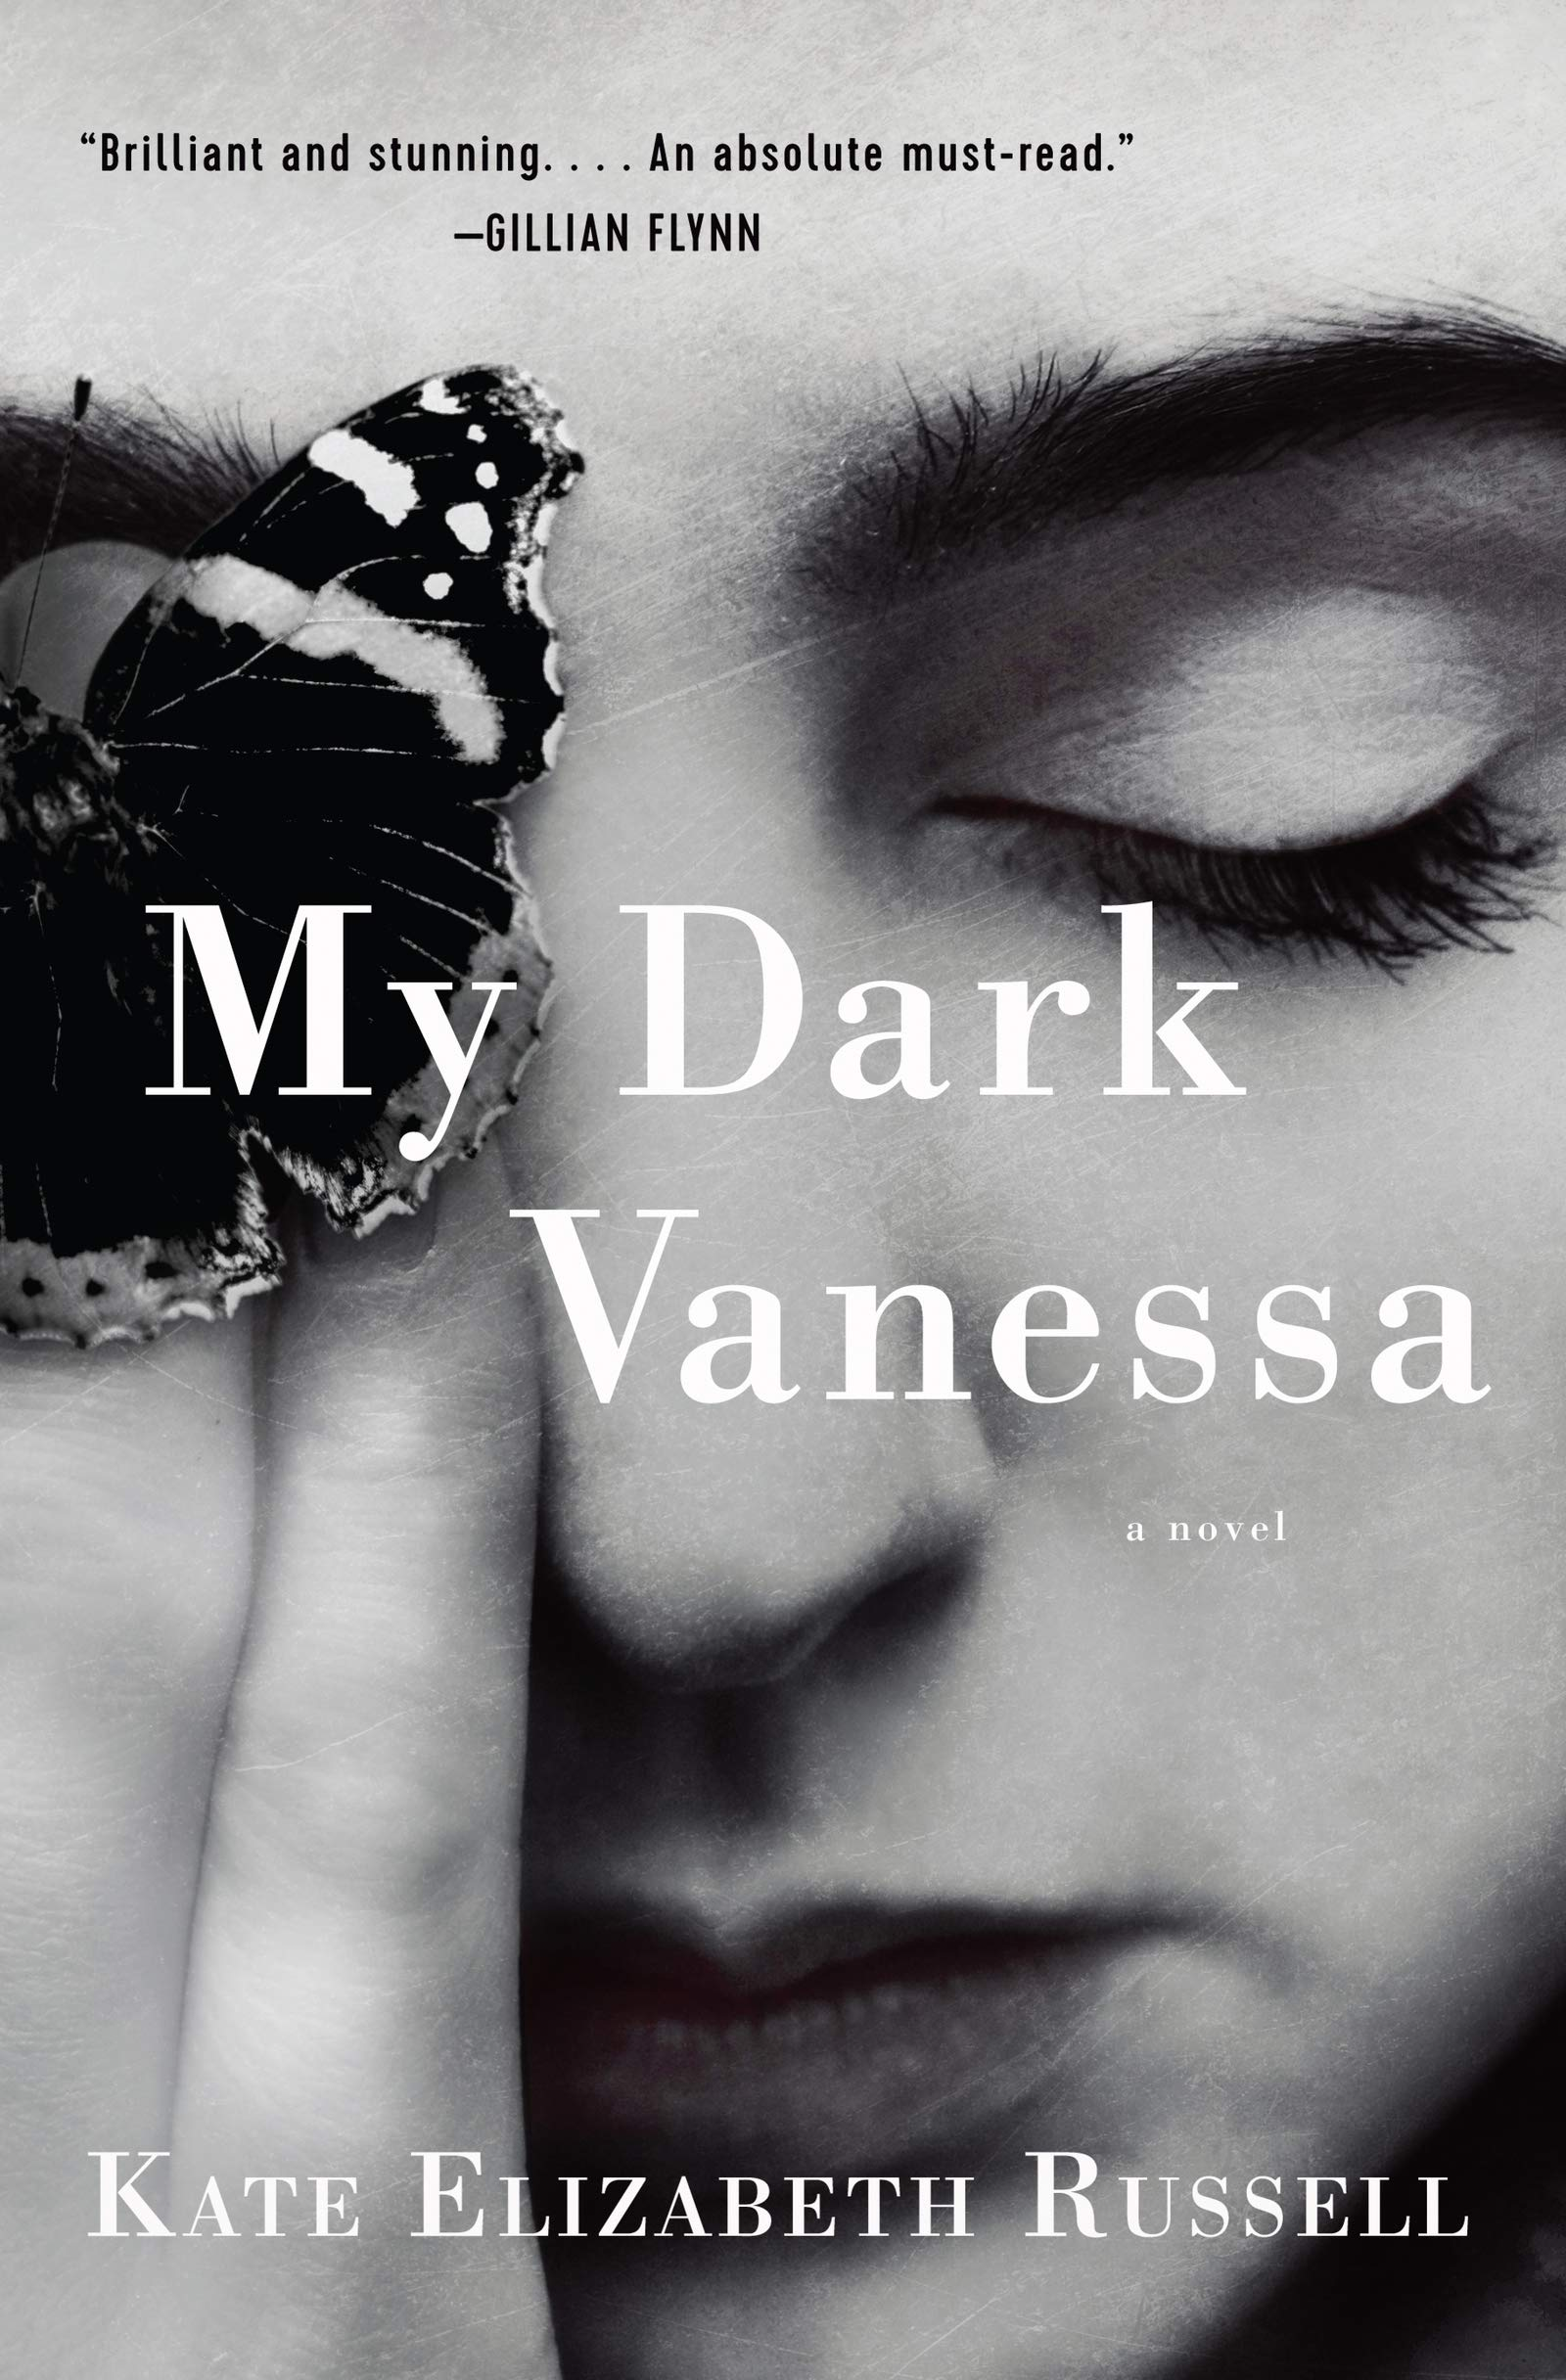 Amazon.com: My Dark Vanessa: A Novel (9780062941503): Russell ...